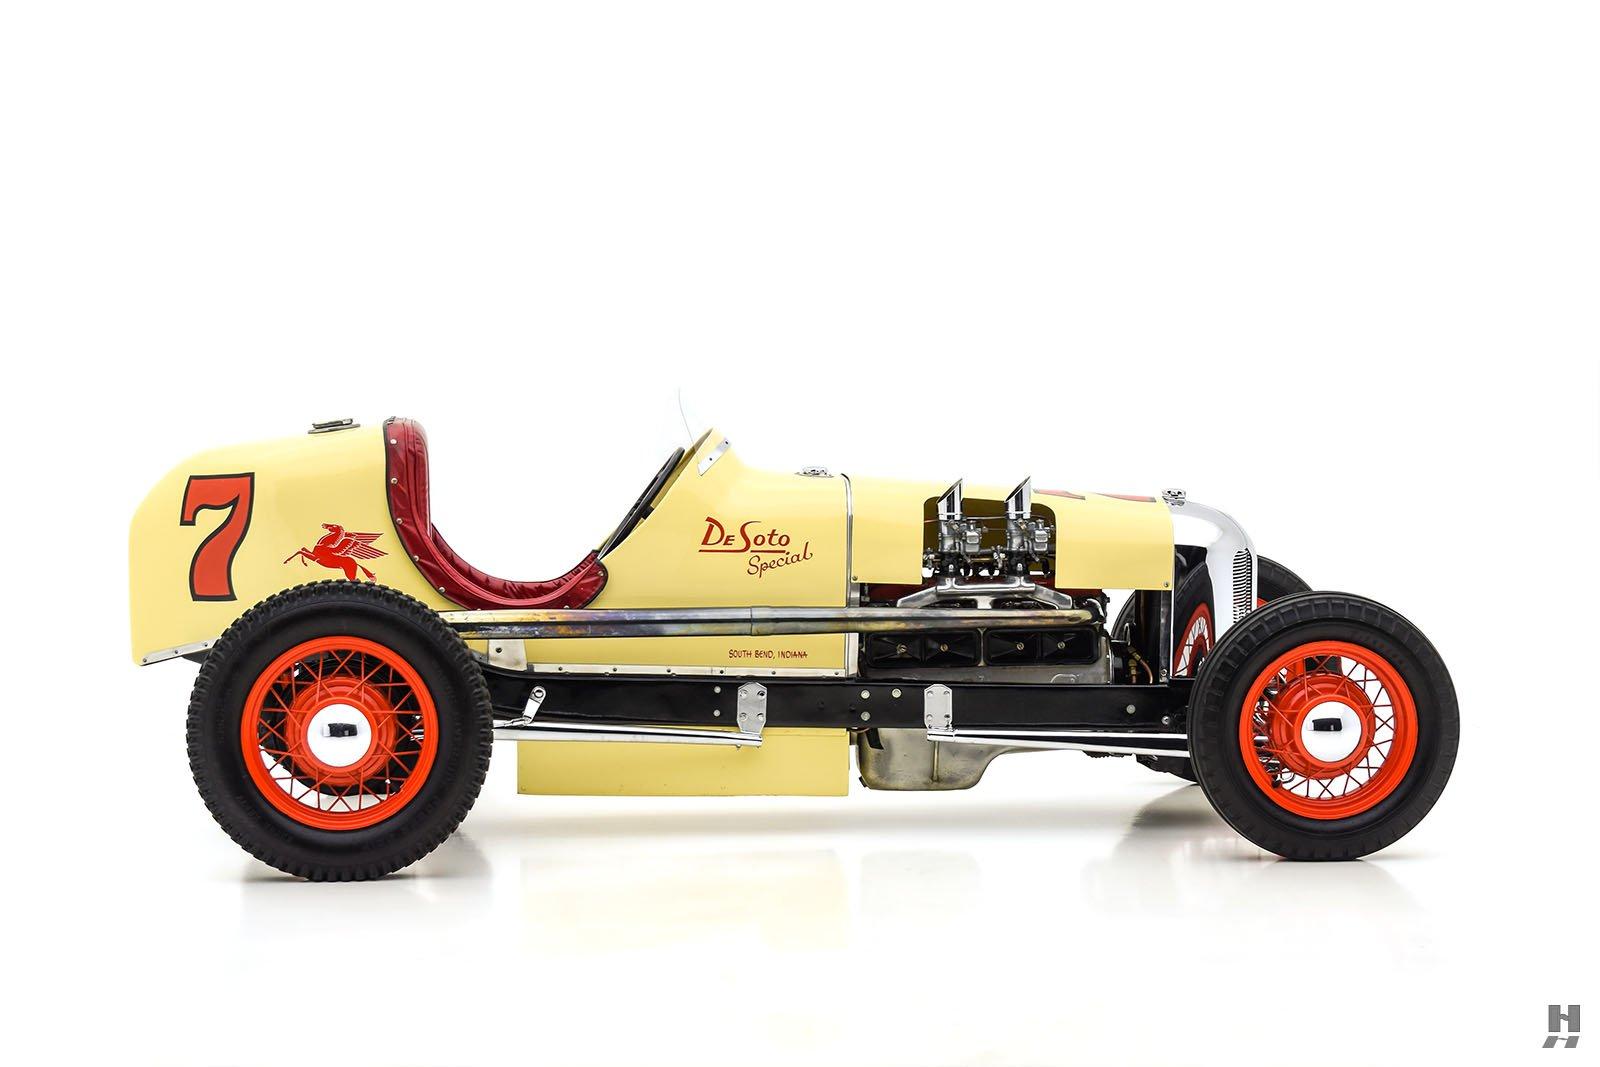 1928 DeSoto Special For Sale By Hyman LTD